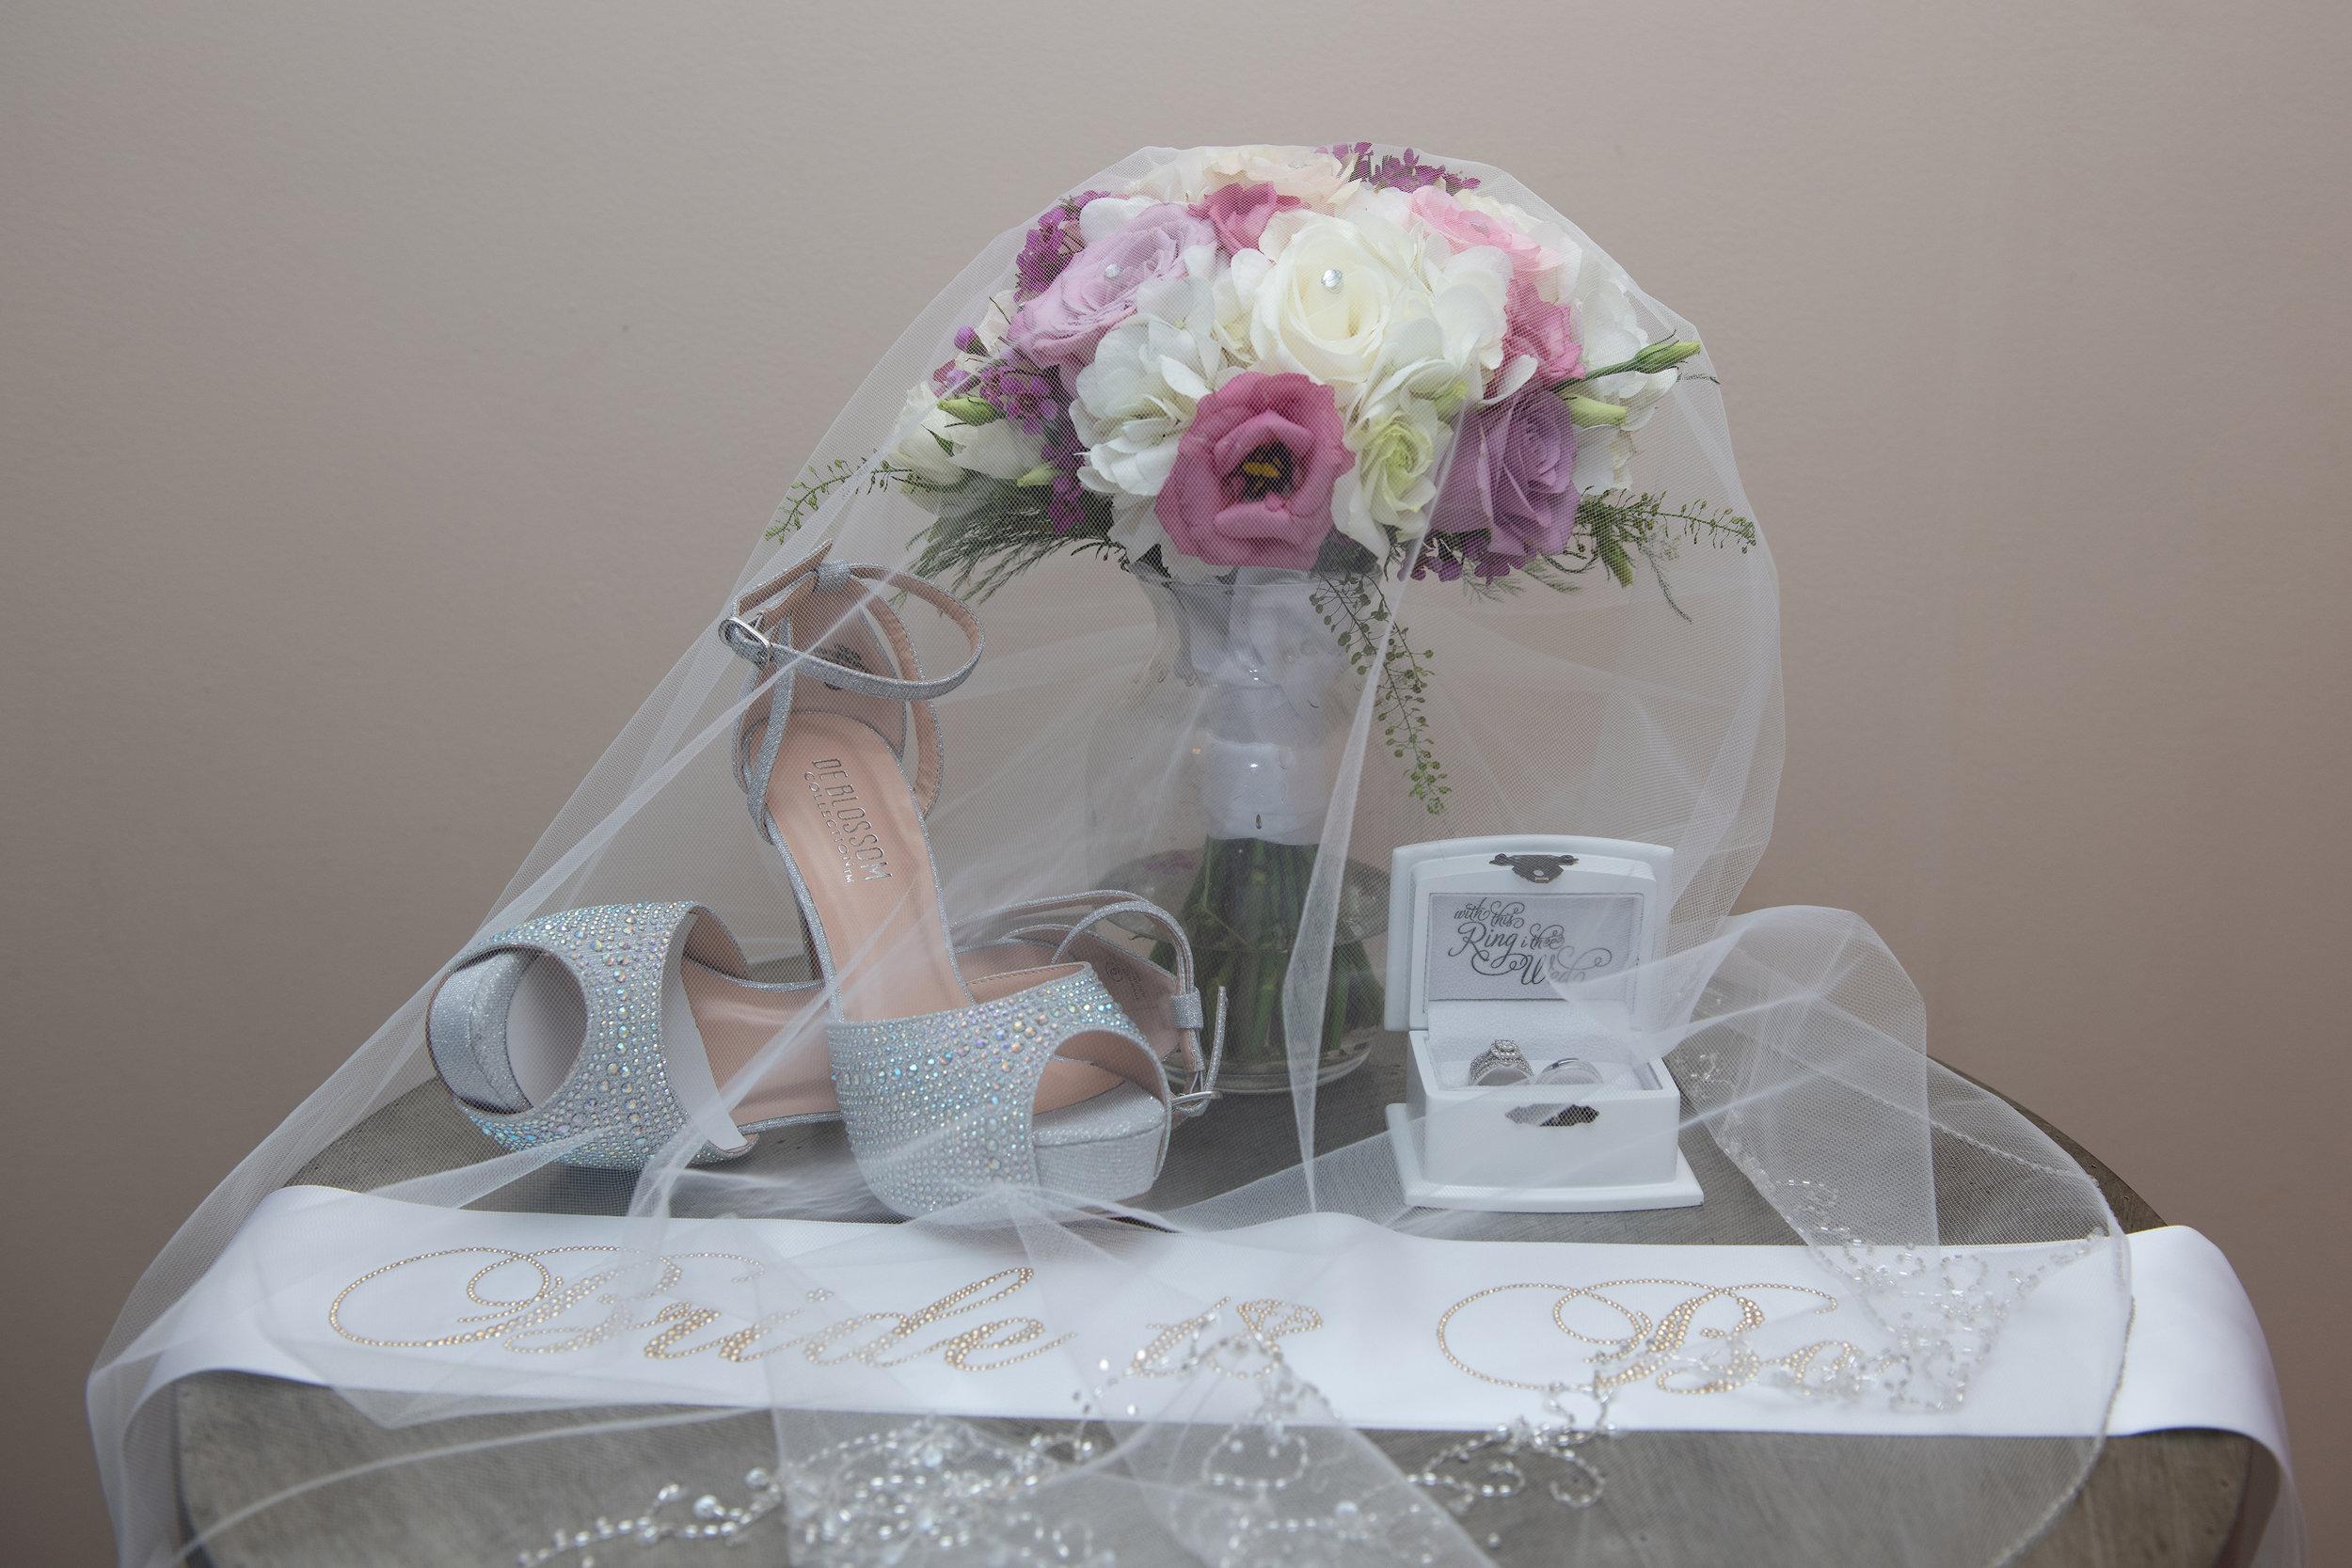 WICKHAM PARK WEDDING WEDDING VEIL COVERING BRIDE BOUQUET, WEDDING RINGS AND WEDDING SHOES